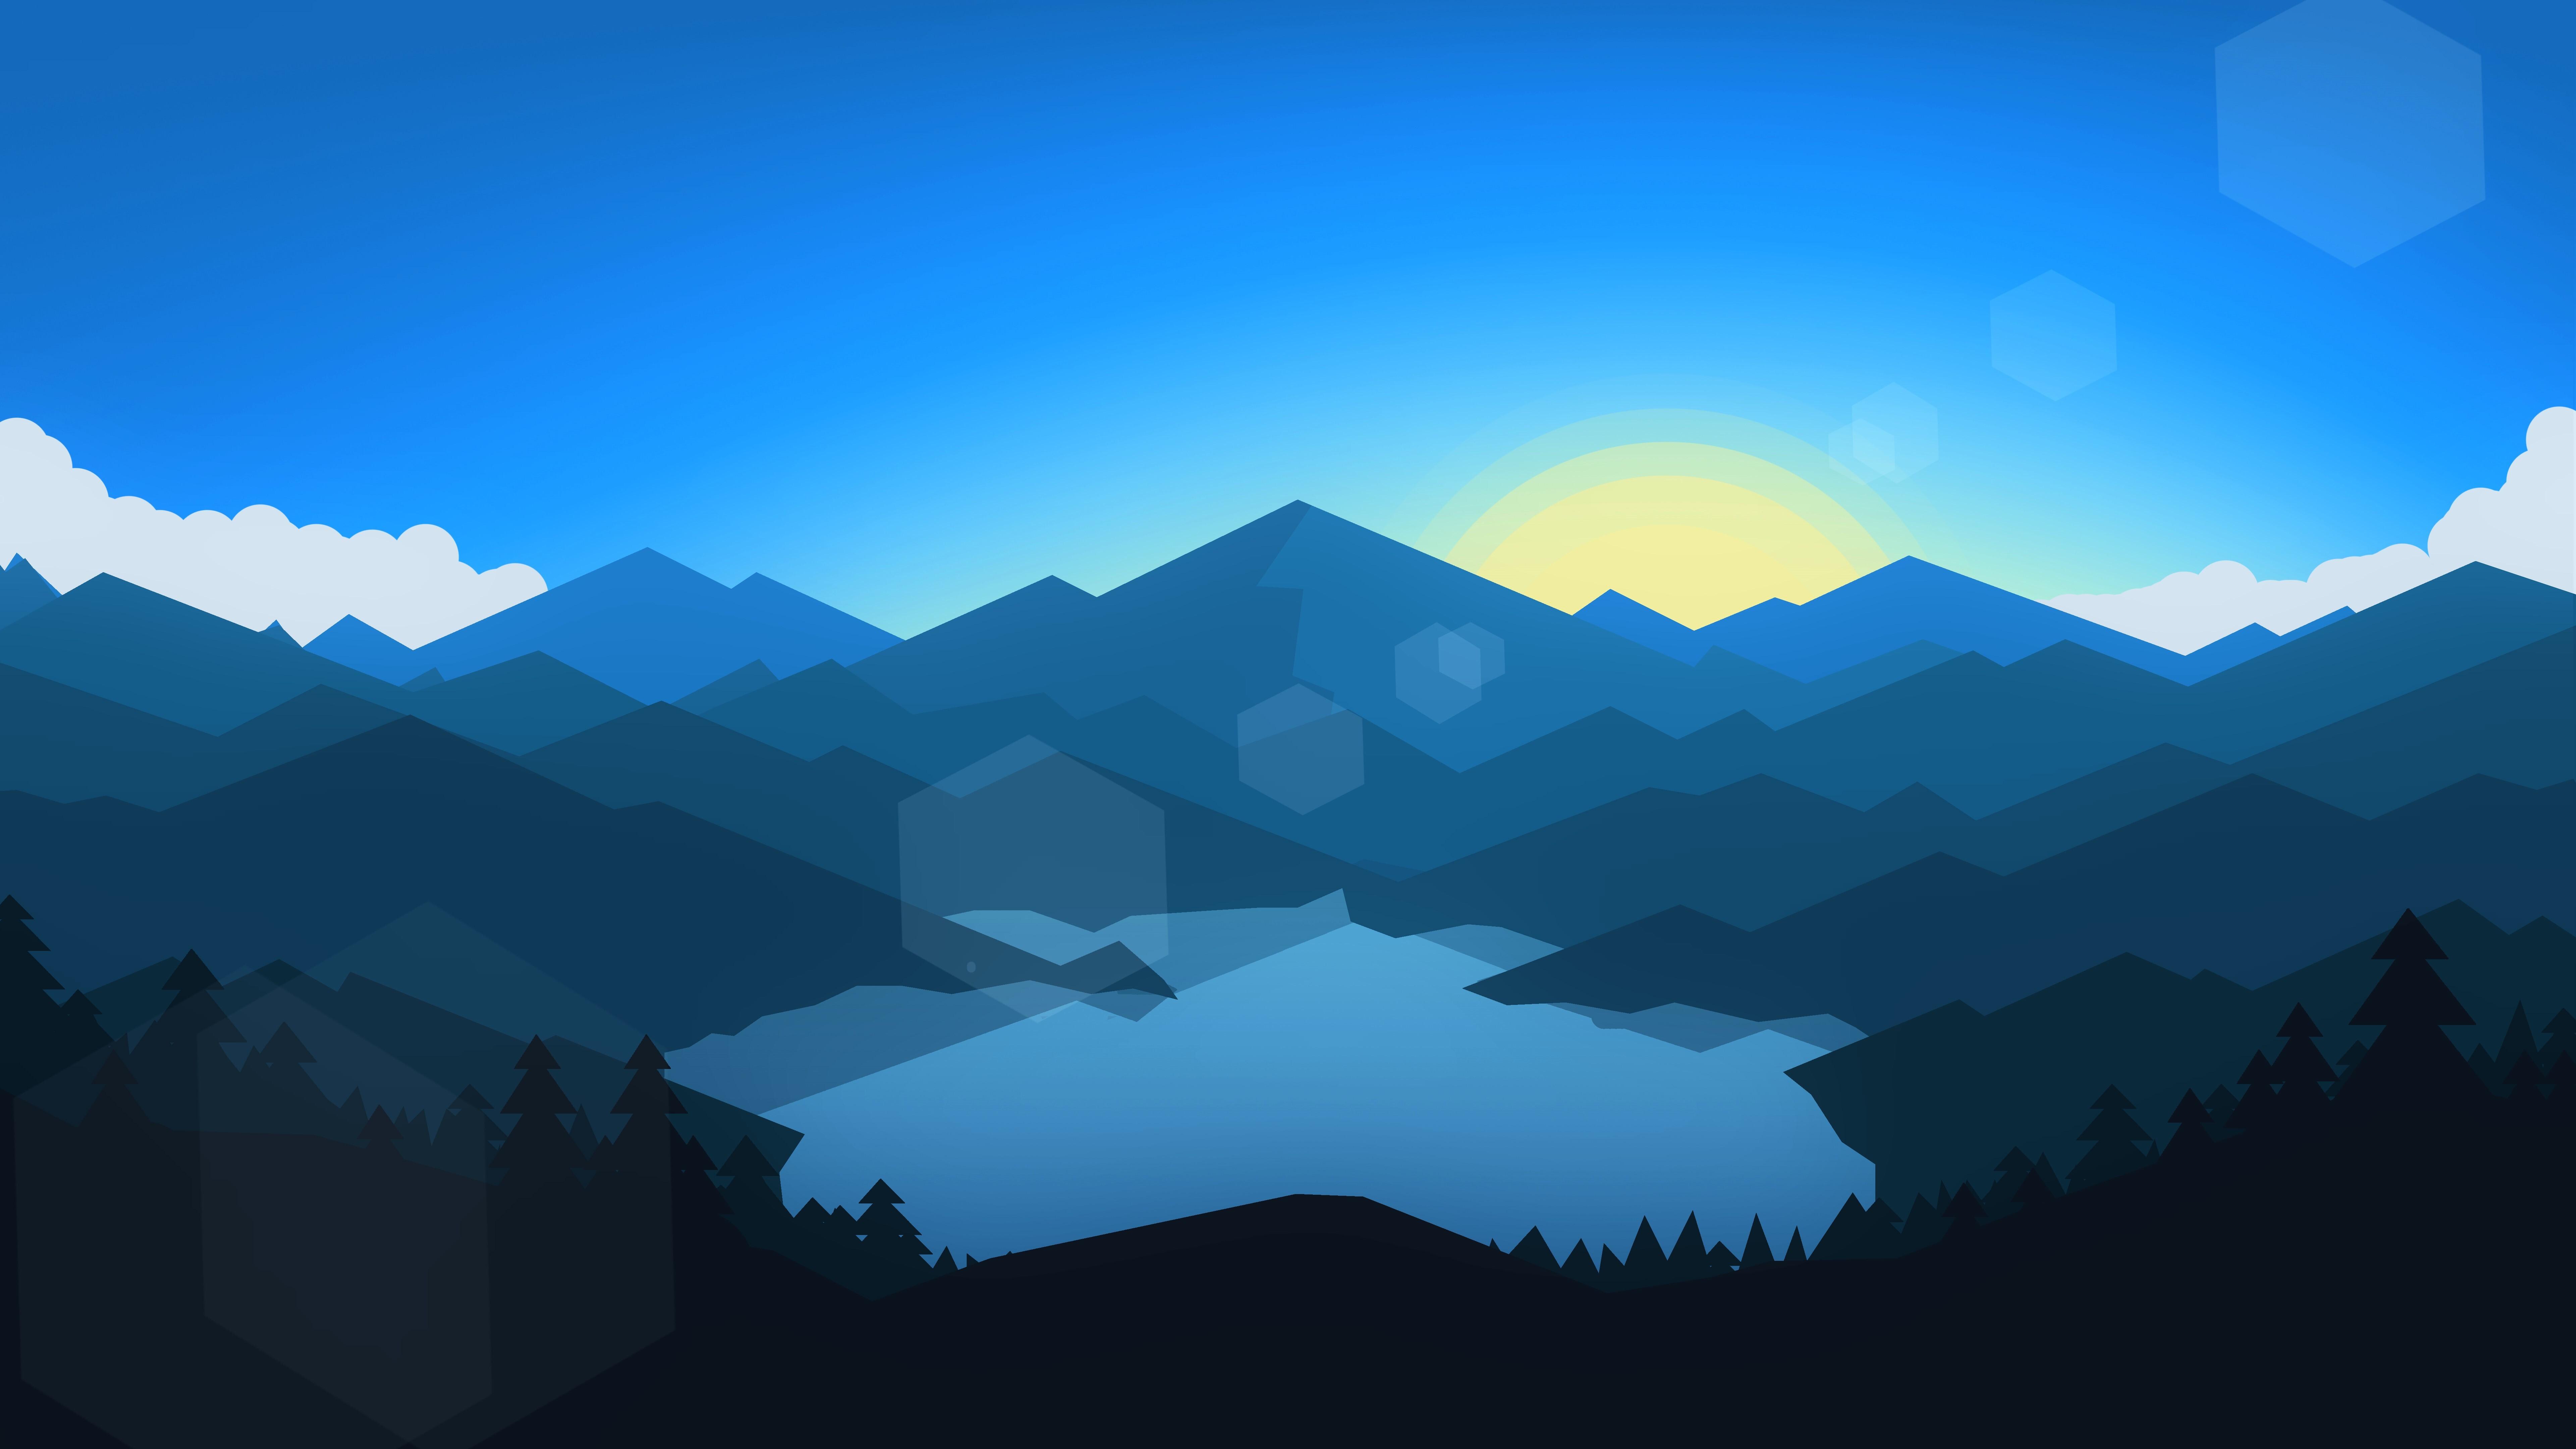 Minimalism Mountain Peak Full Hd Wallpaper: 7680x4320 Forest Mountains Sunset Cool Weather Minimalism